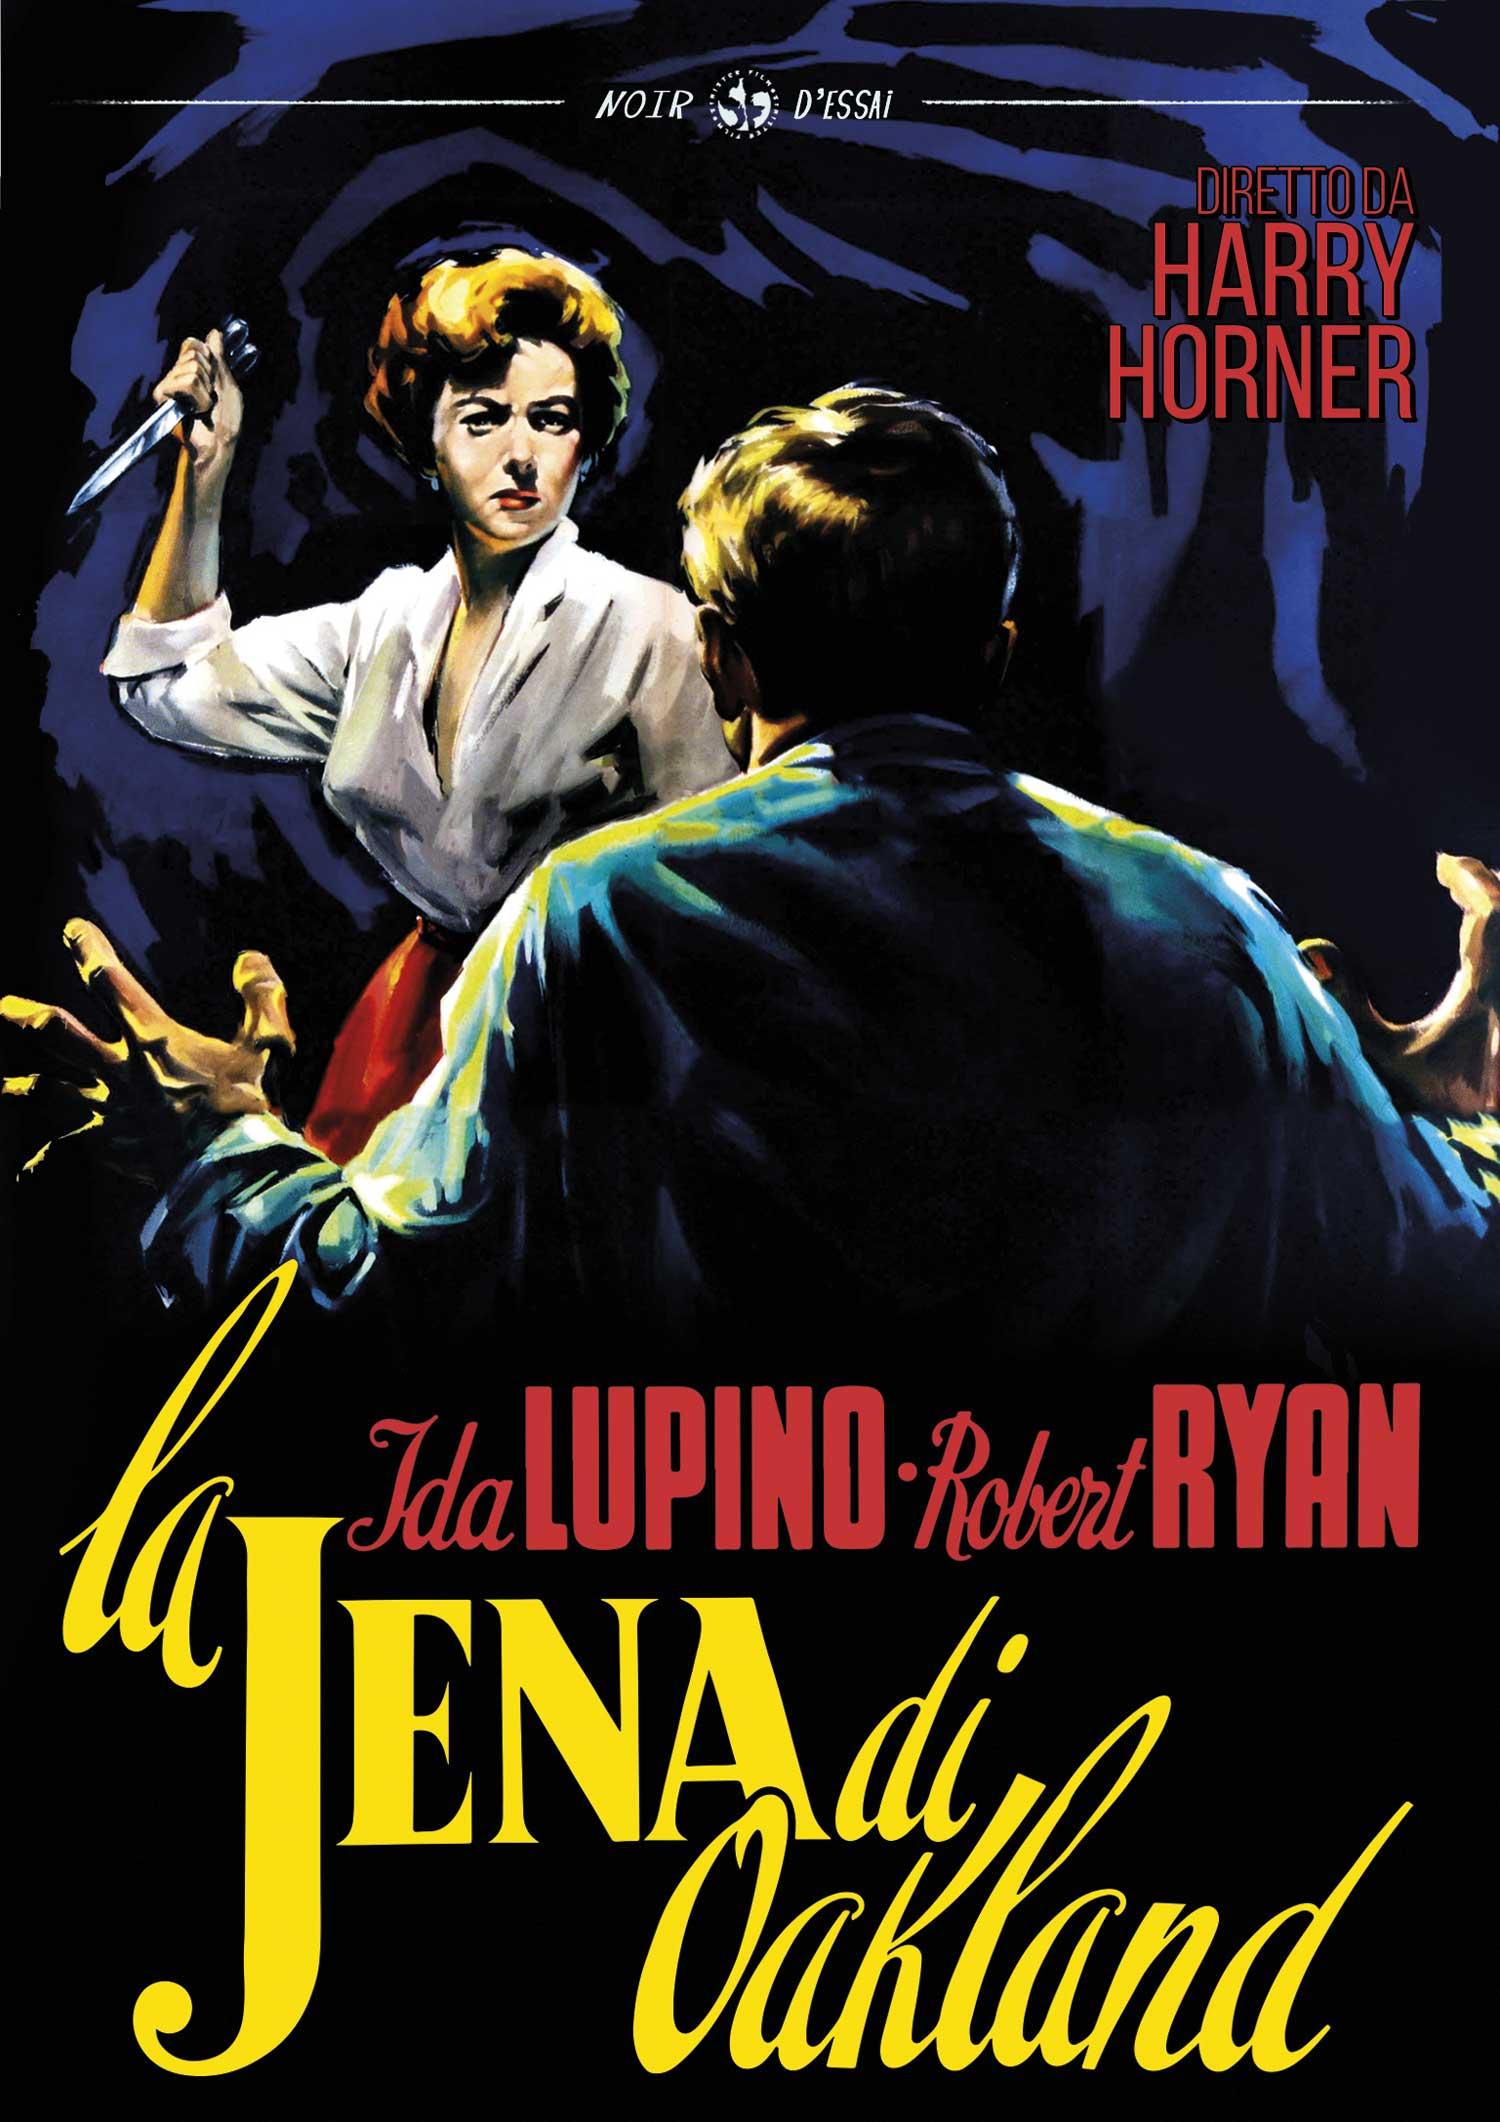 LA JENA DI OAKLAND (DVD)